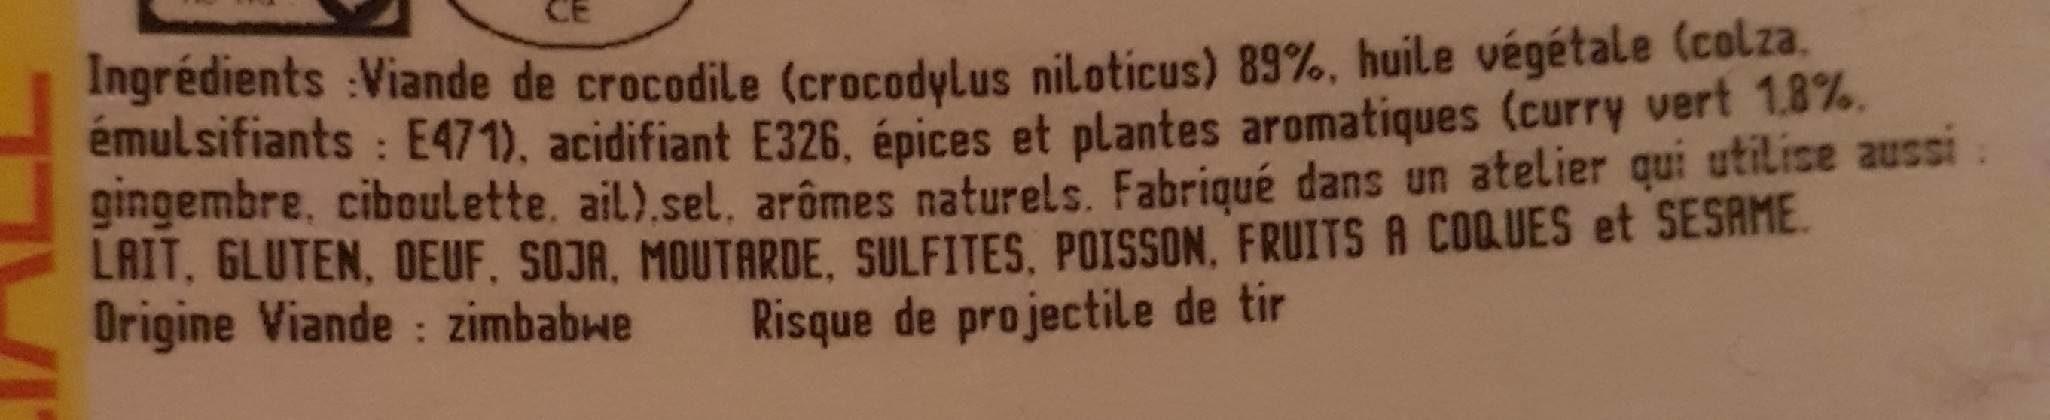 Filet de crocodile - Ingredients - fr